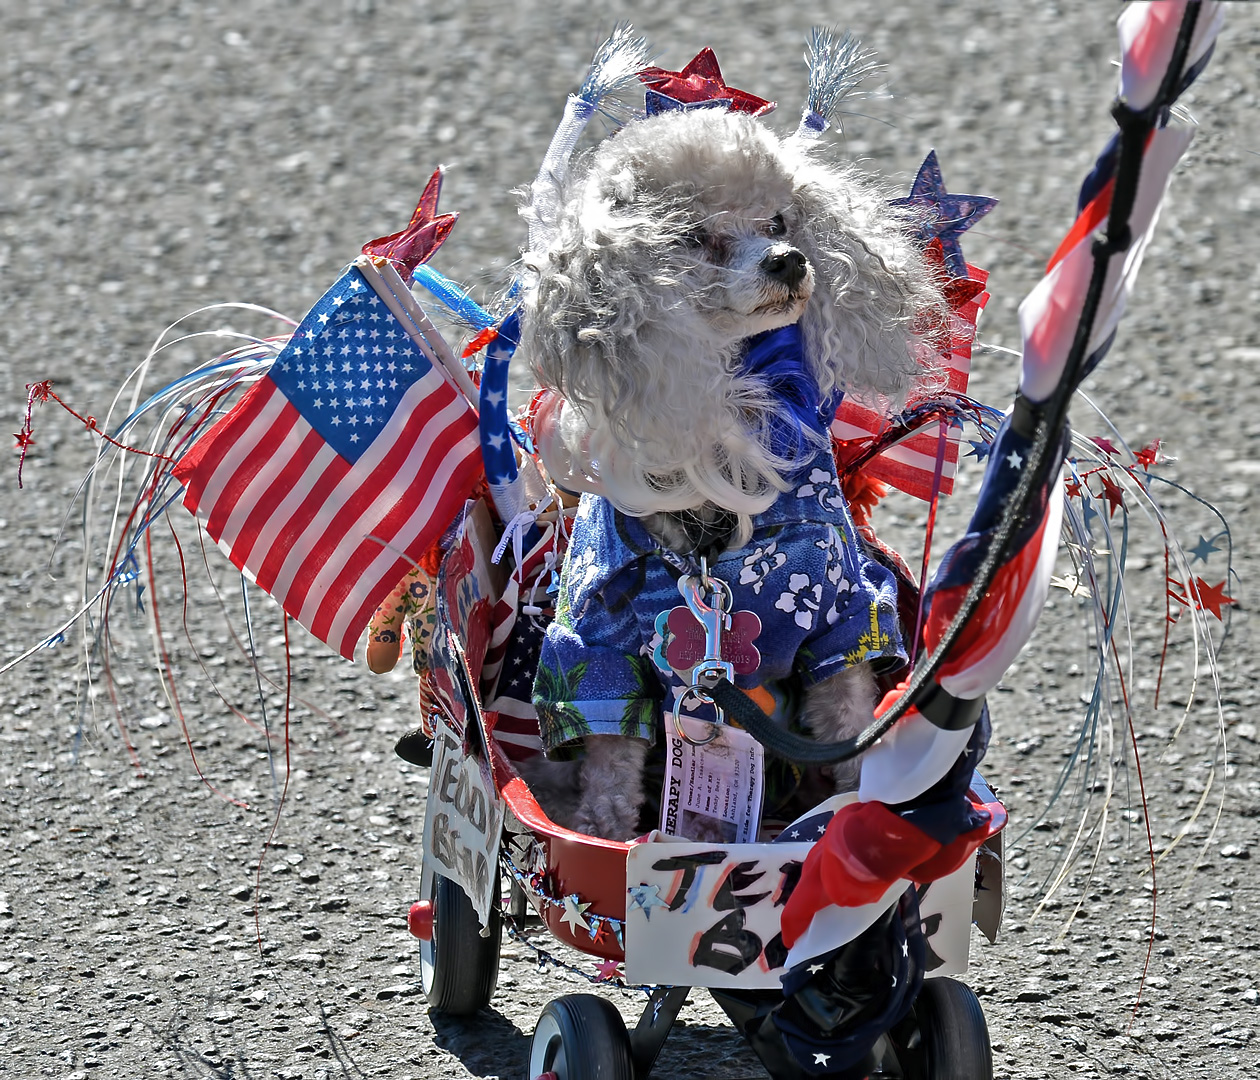 patriotic dog ashland 4th of July parade 2012